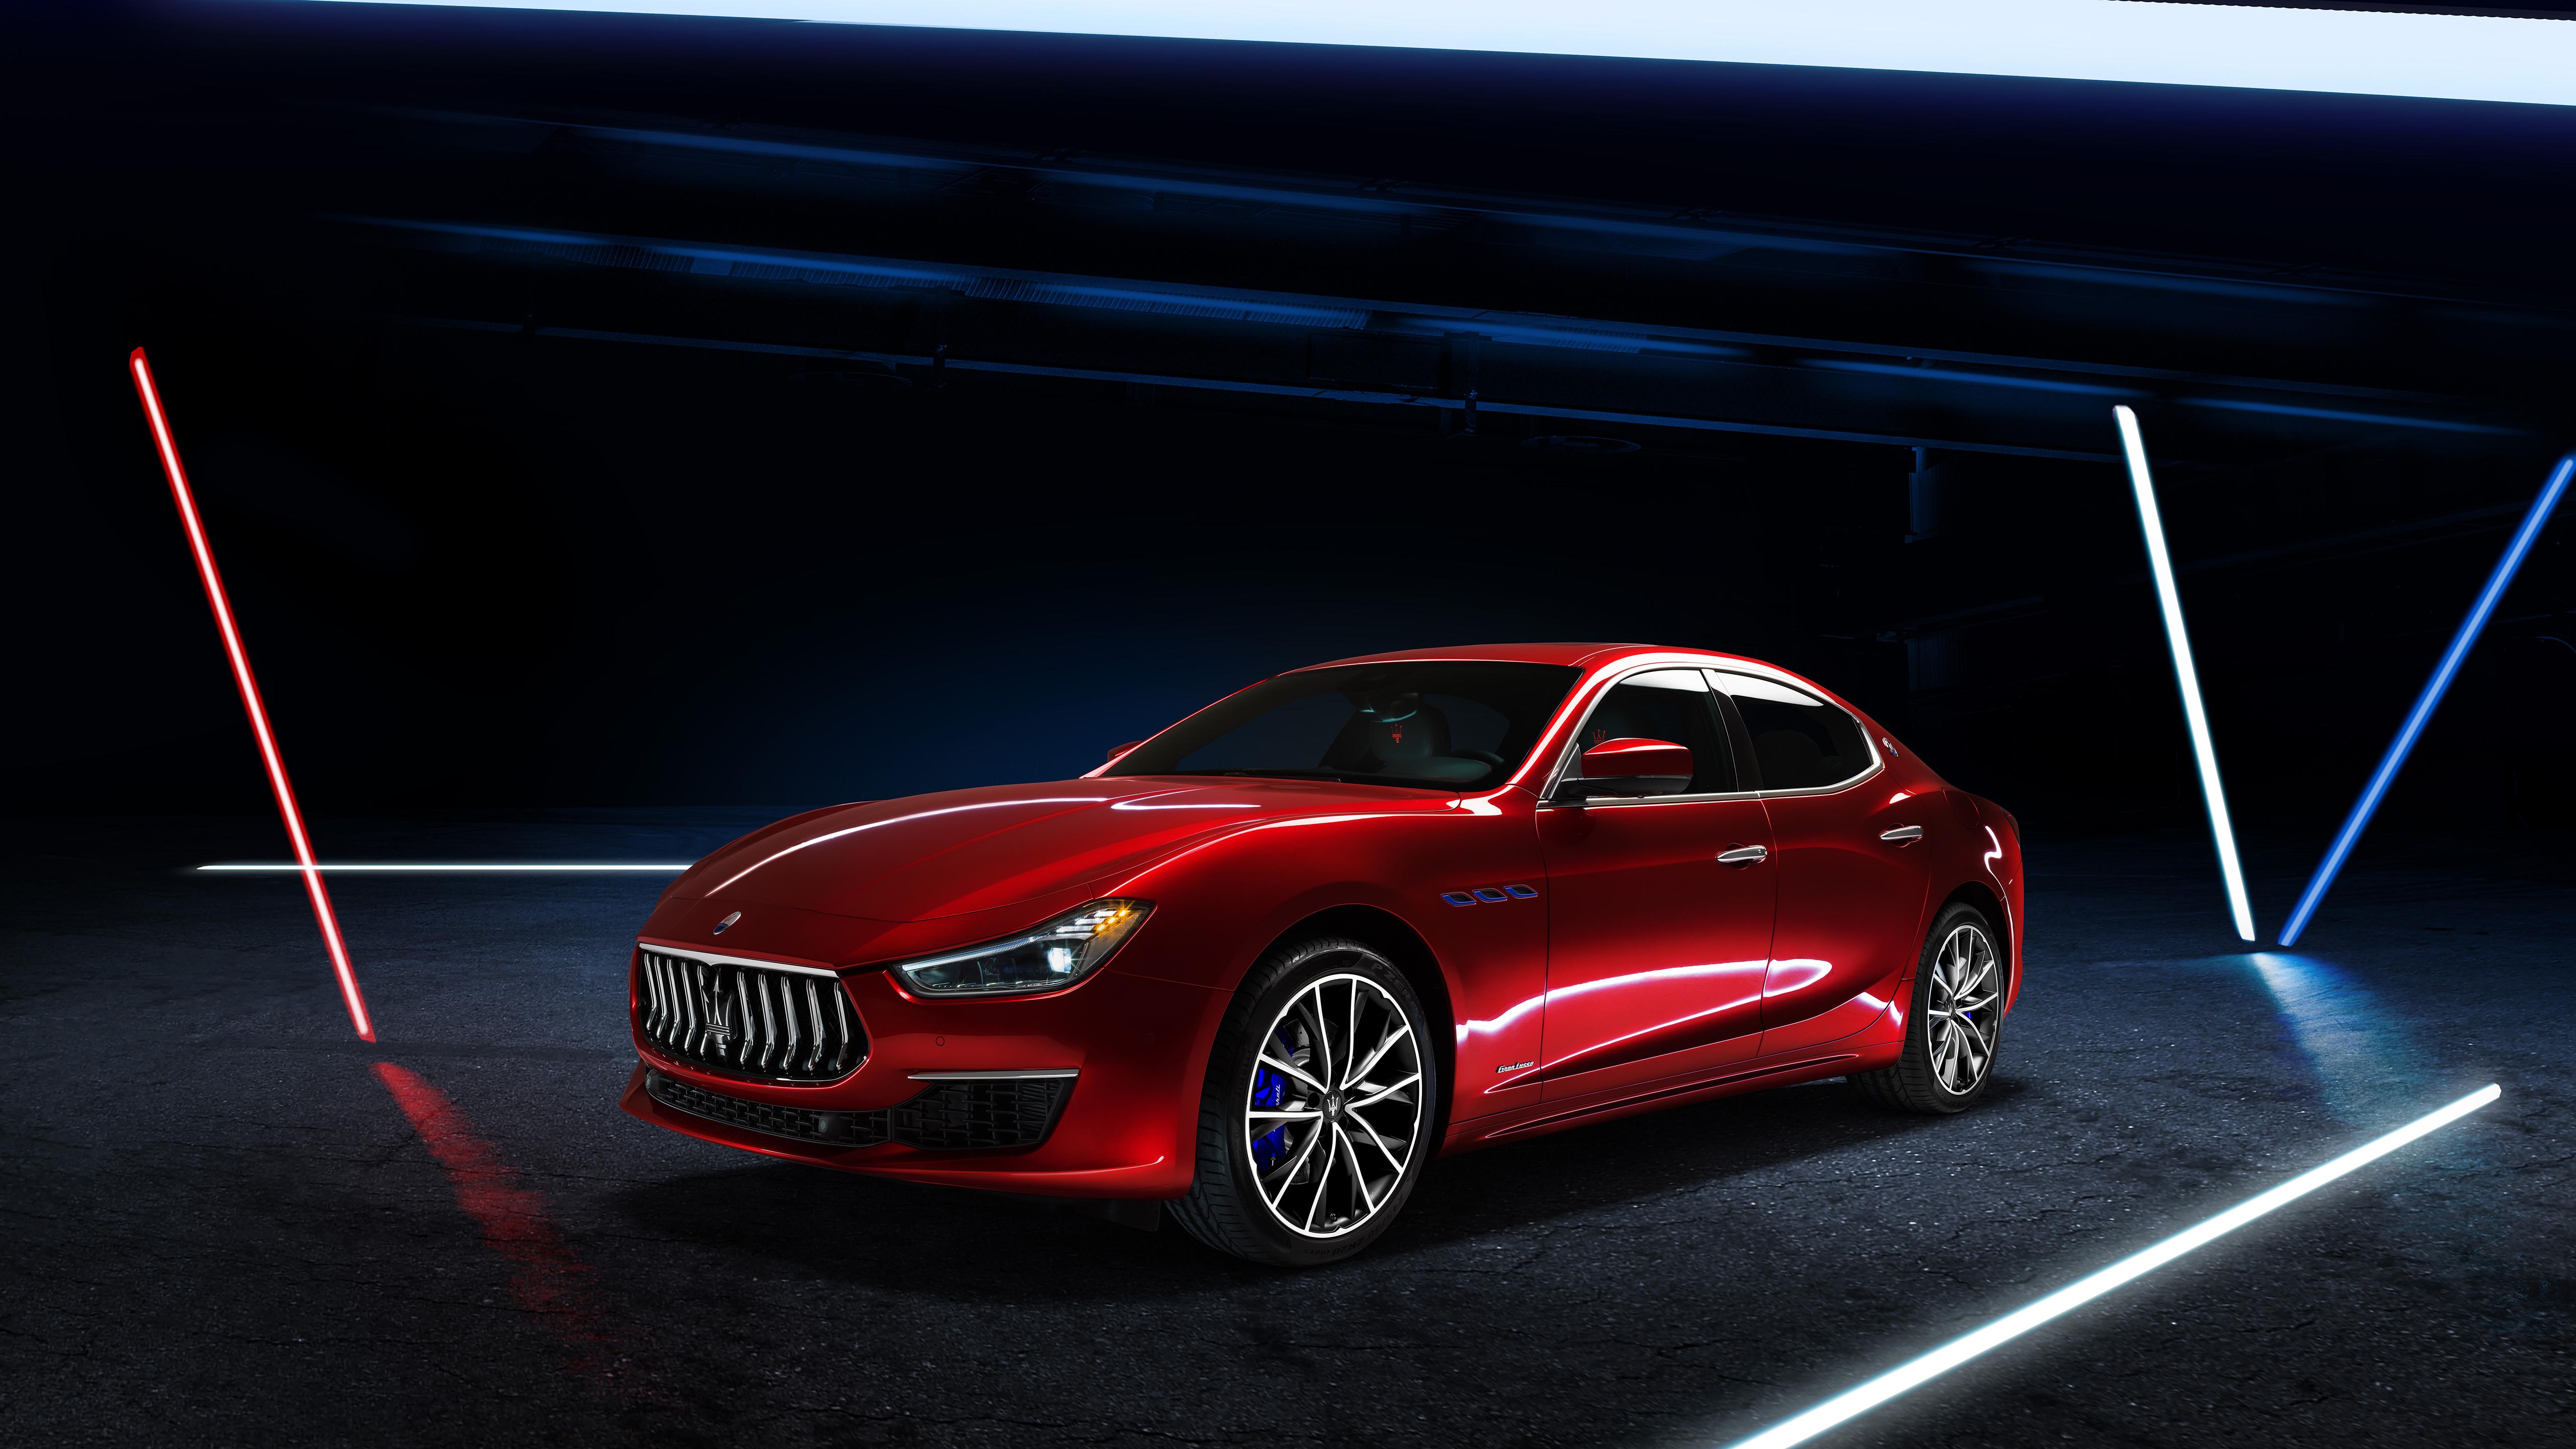 Maserati Ghibli GranLusso Hybrid 2020 5K 4 Wallpaper | HD ...